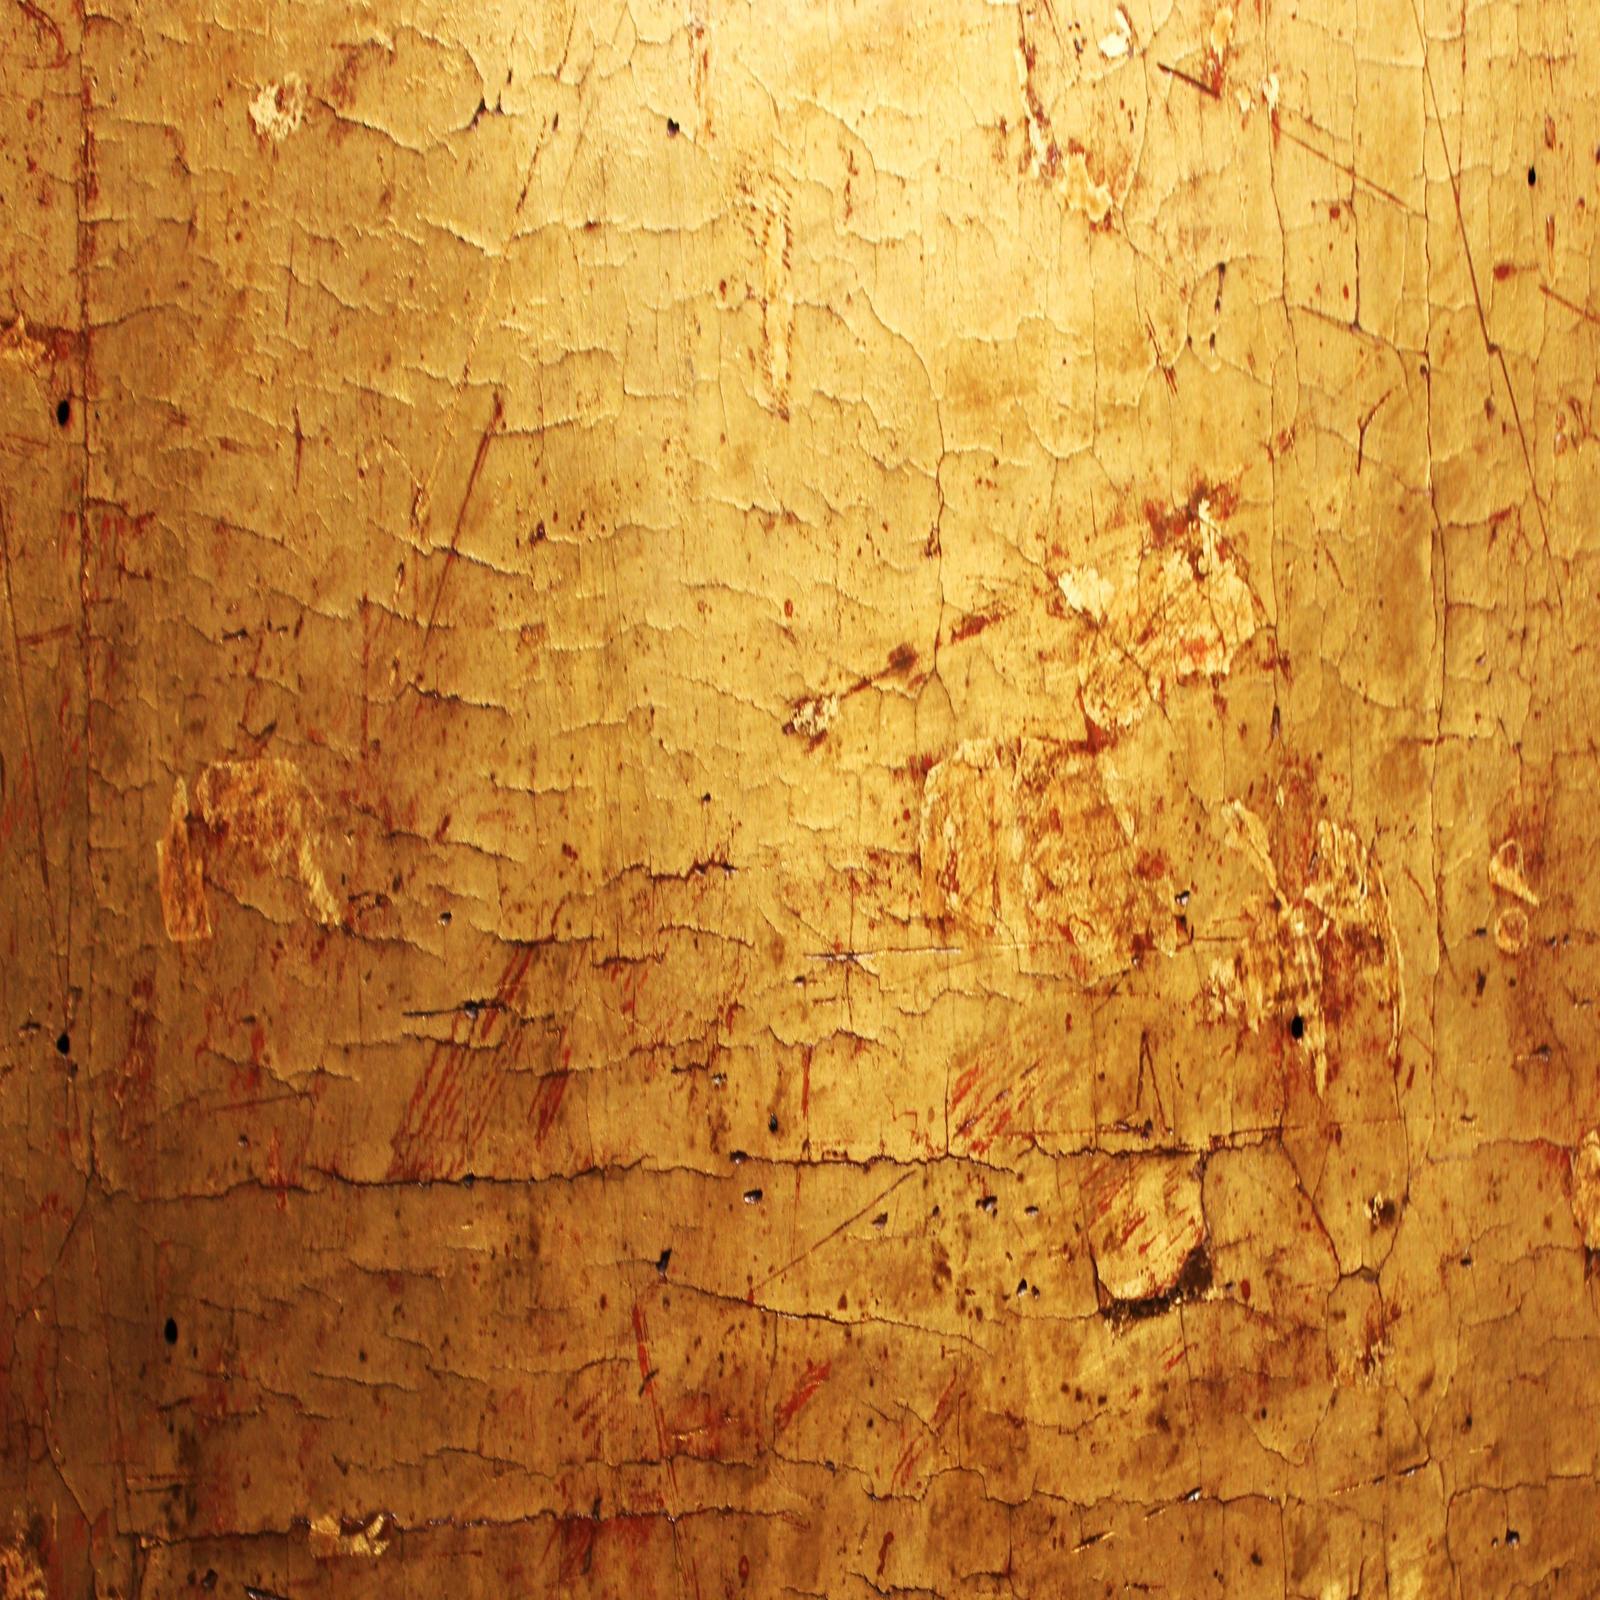 Medieval Gold Texture by SenhArt